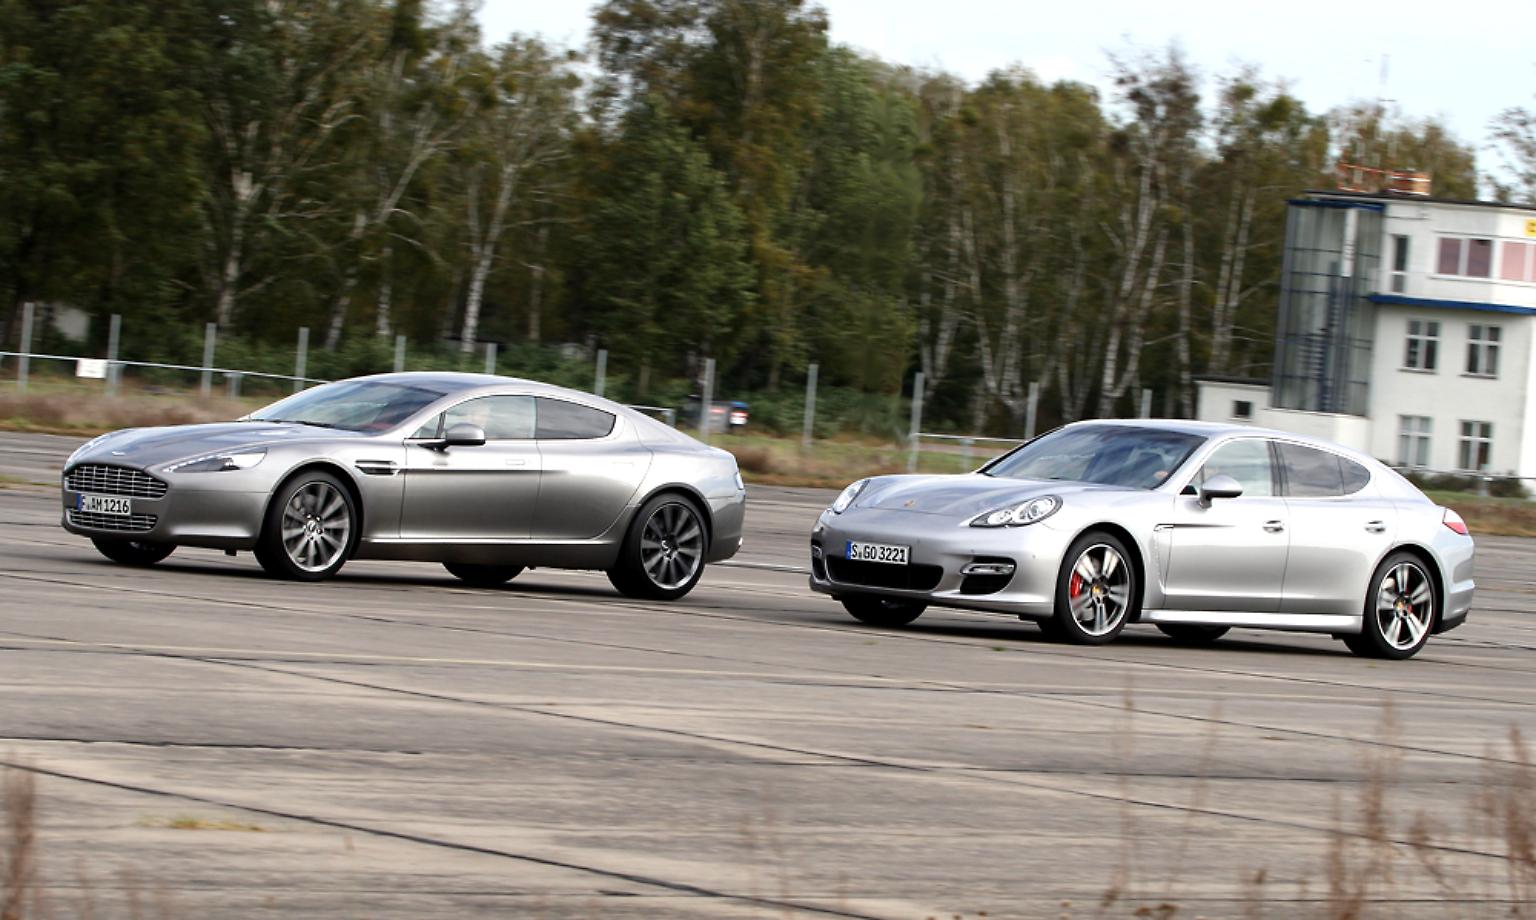 Kampf Der Edelmonster Porsche Panamera Vs Aston Martin Rapide N Tv De